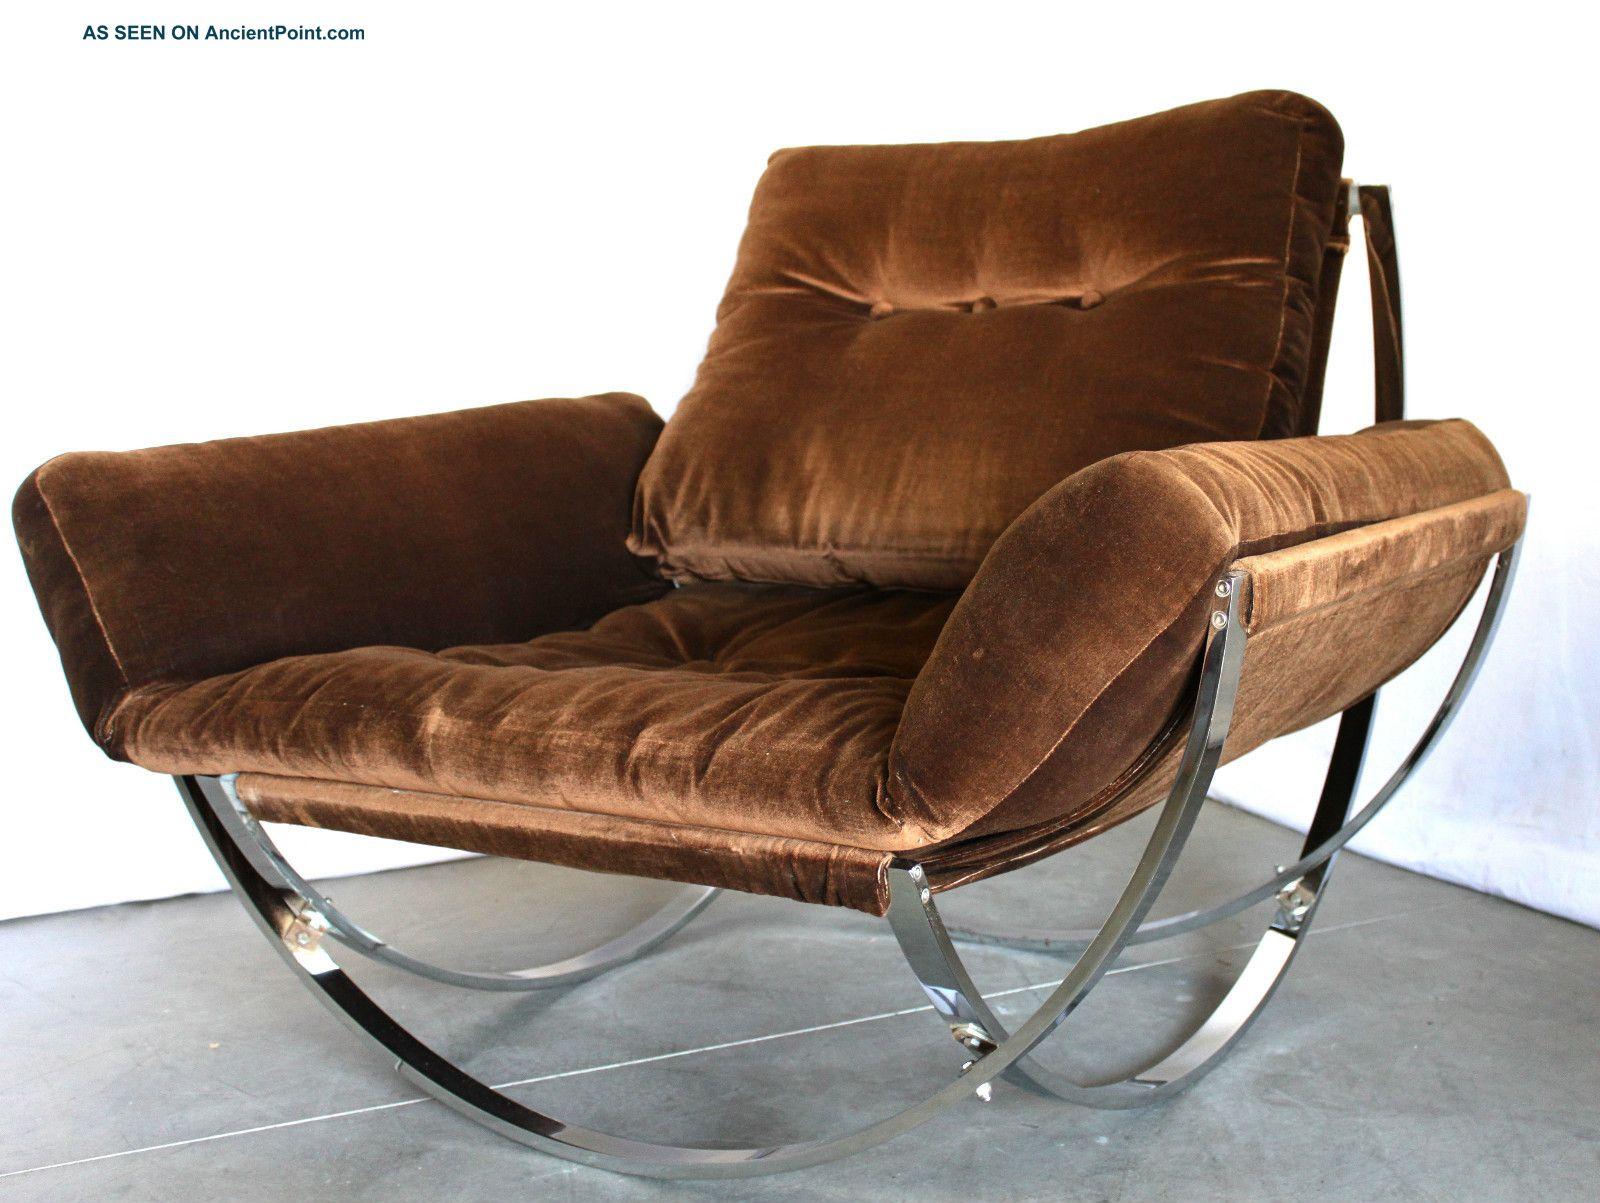 ... rocking chair midcentury modern rocking chair high quality lounge